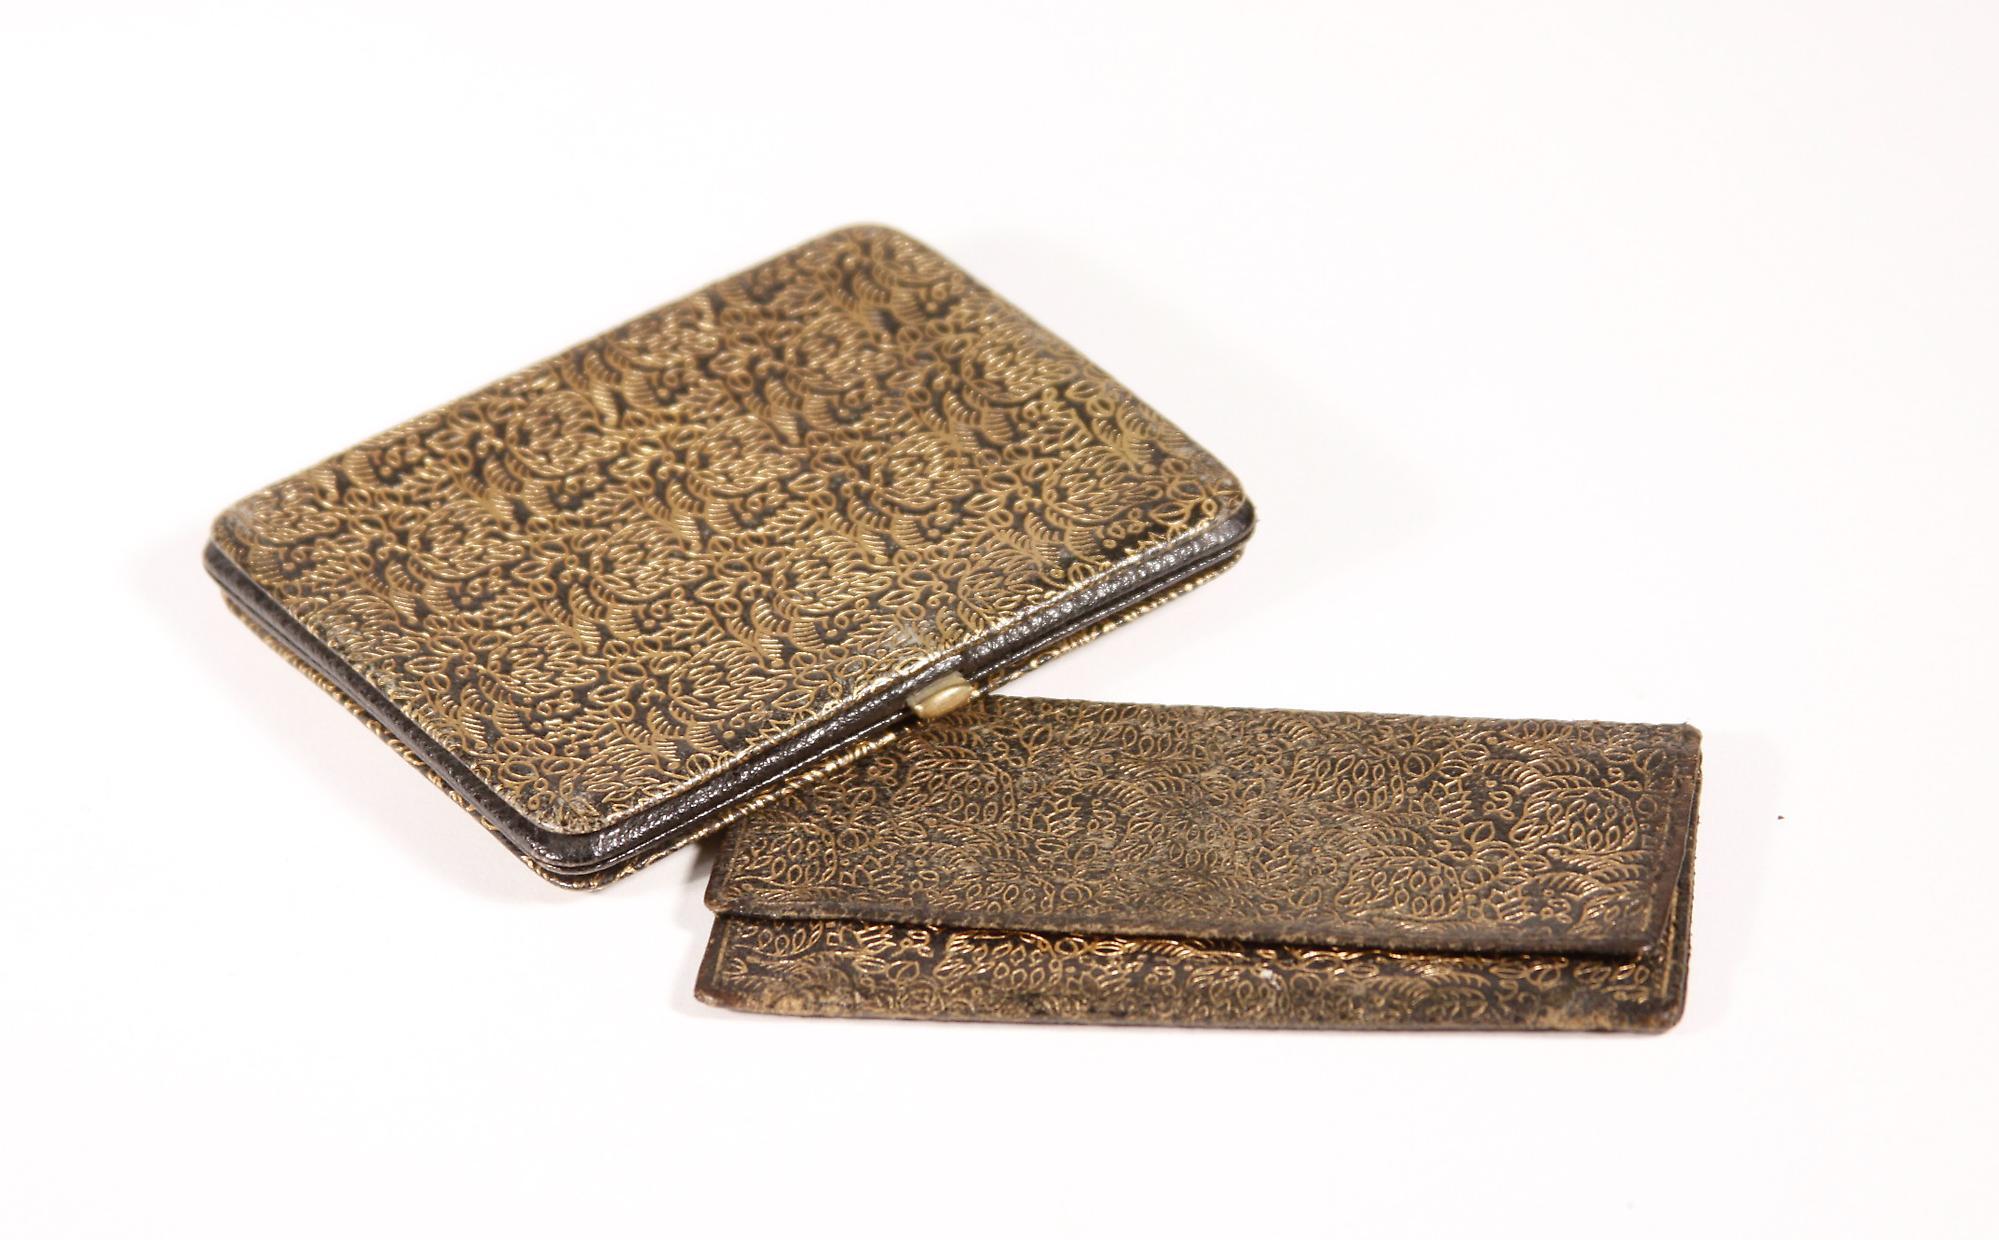 Dagobert Peche Leather Cigarette Case and Card Holder 3